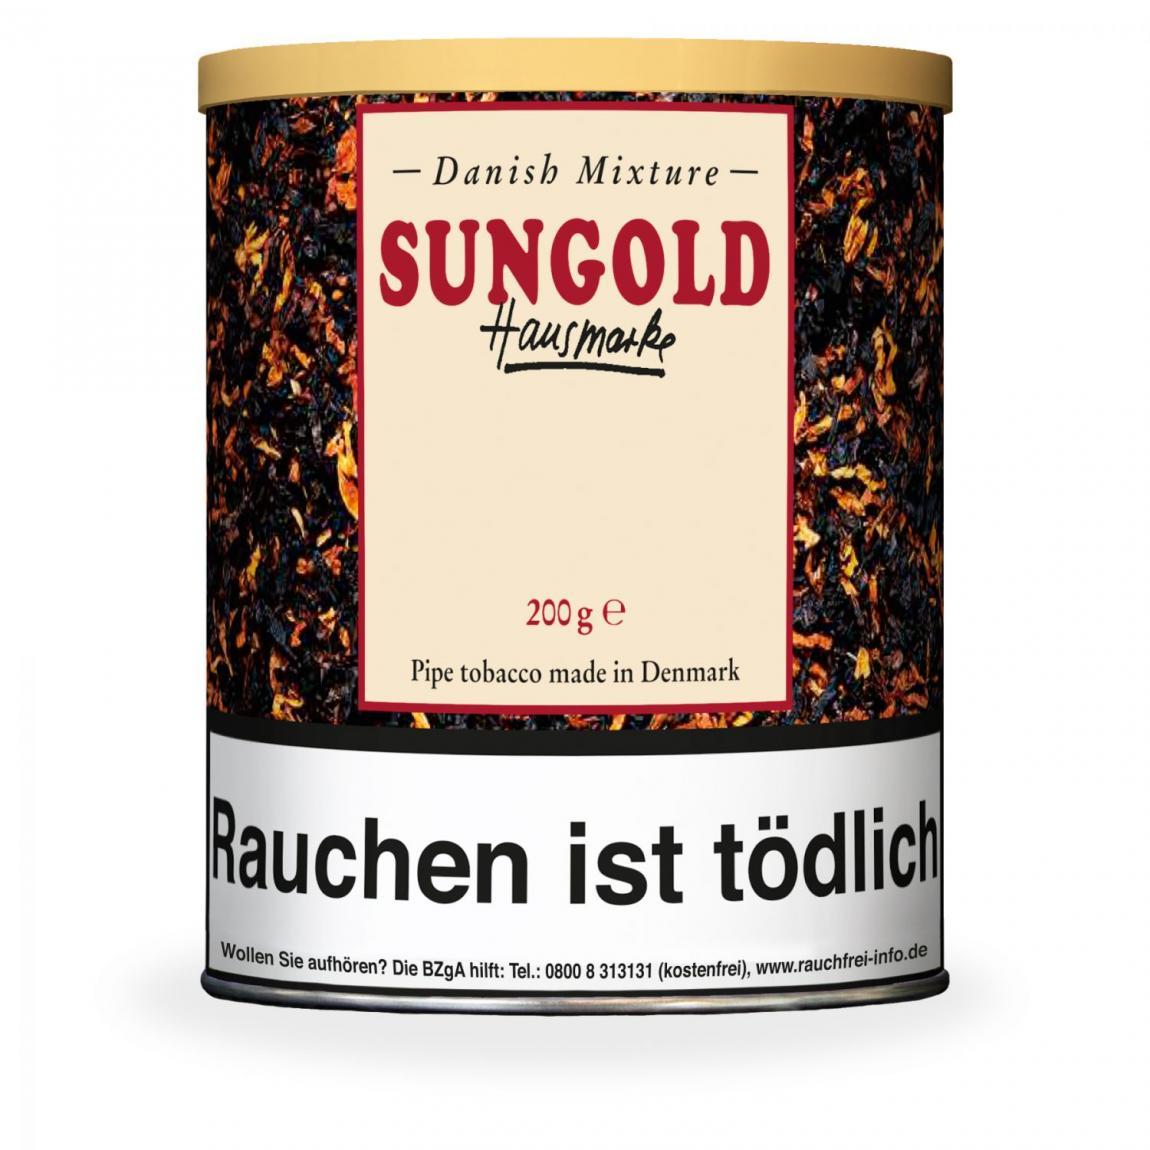 Hausmarke »Danish Mixture Sungold« 200g Dose